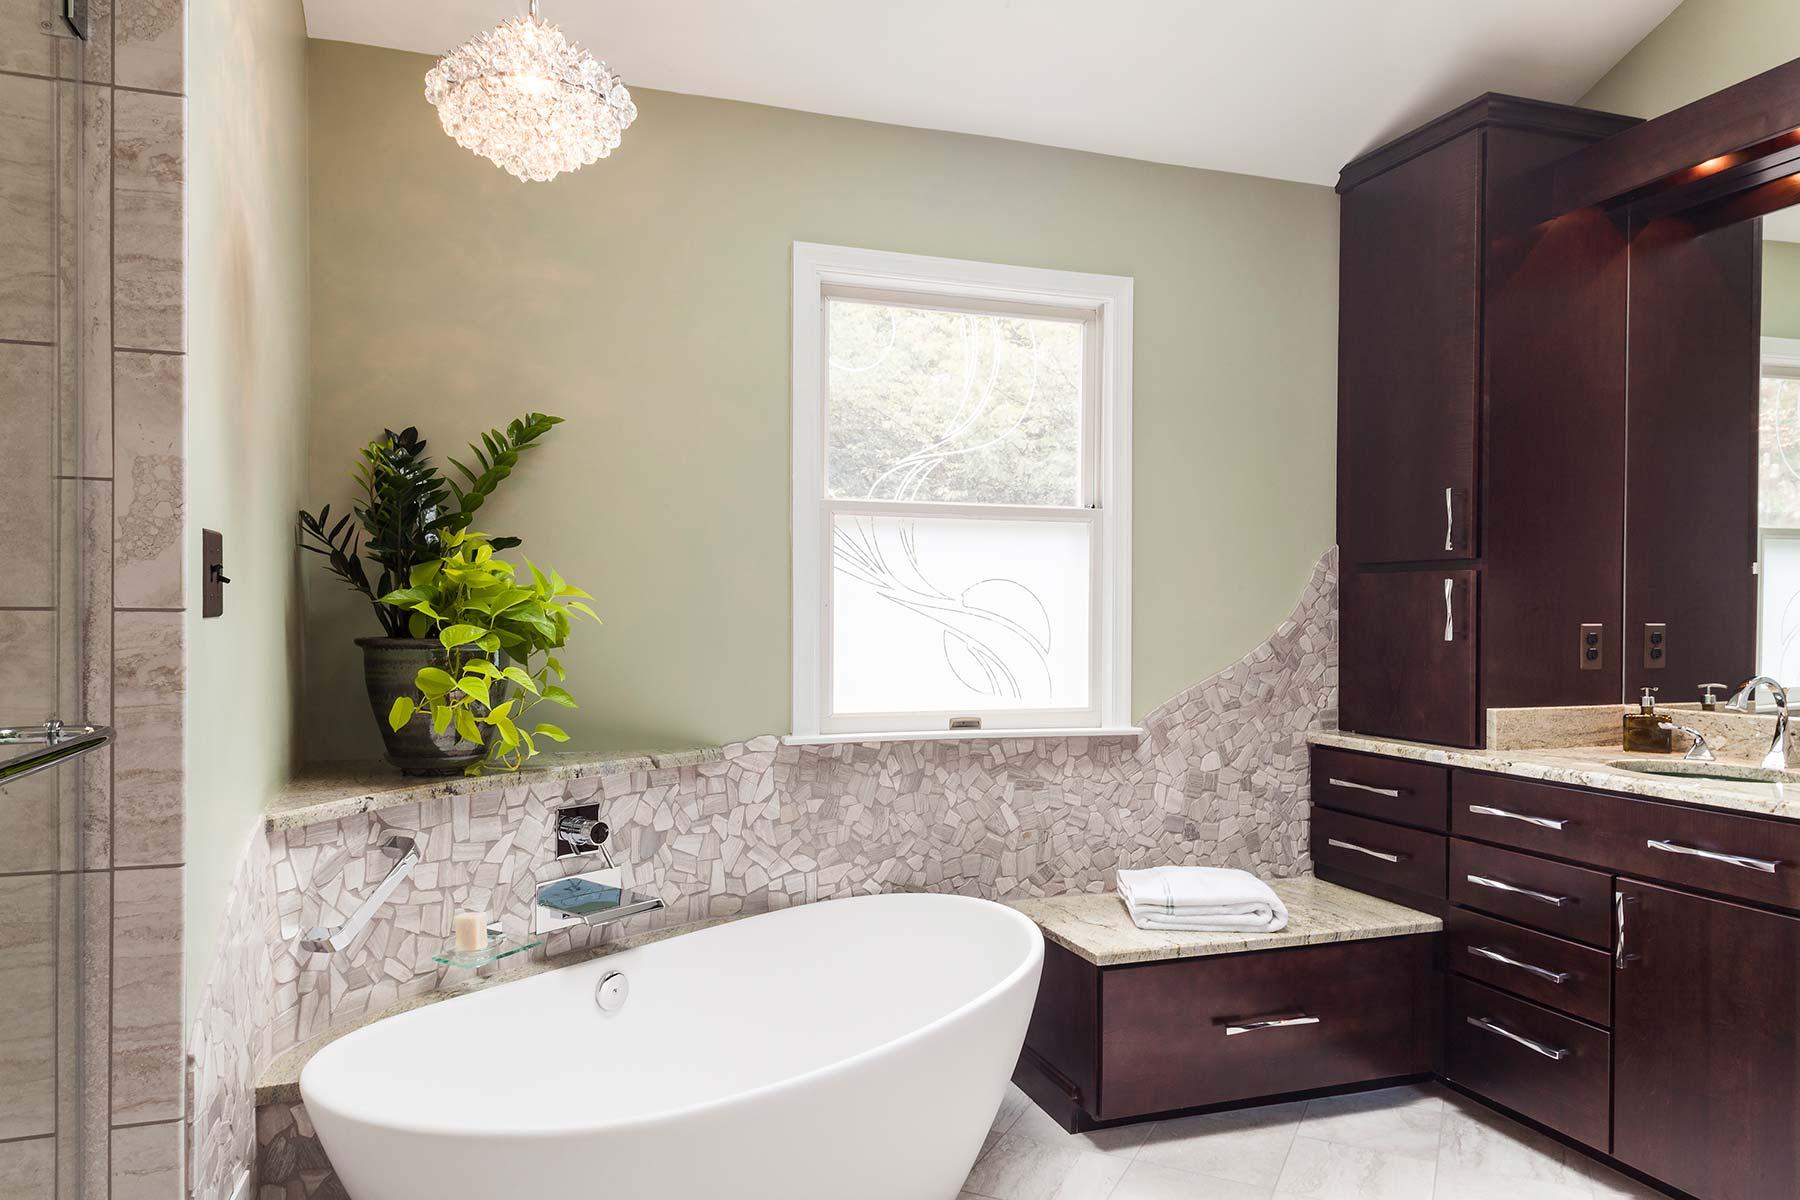 Bathroom Remodeling Harford County Md kitchen & bathroom remodeling | custom homes | t.w. ellis